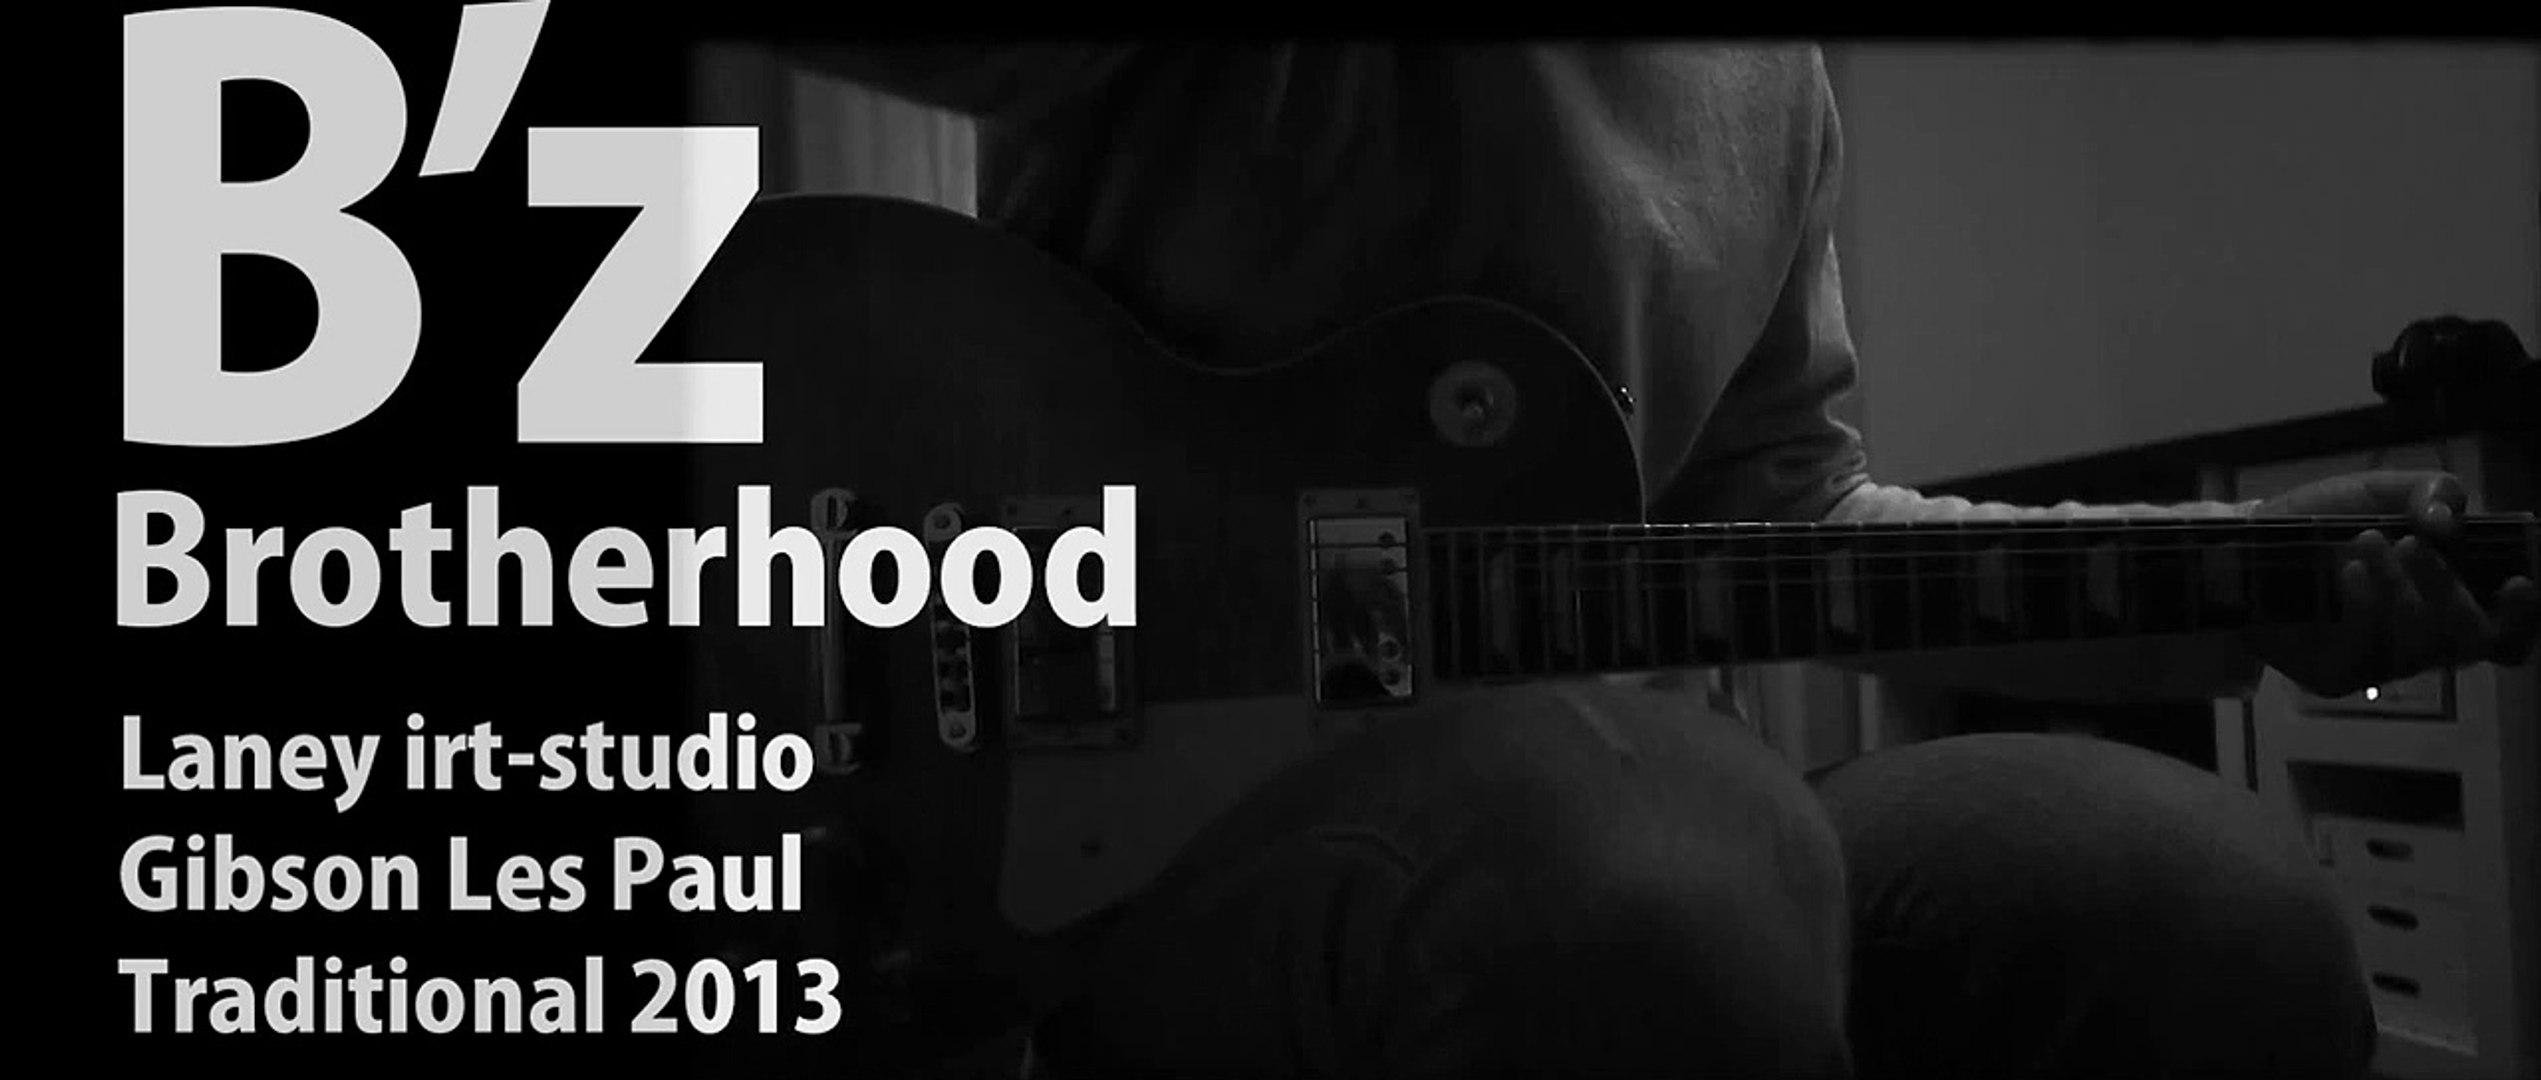 B'z Brotherhood ギター演奏